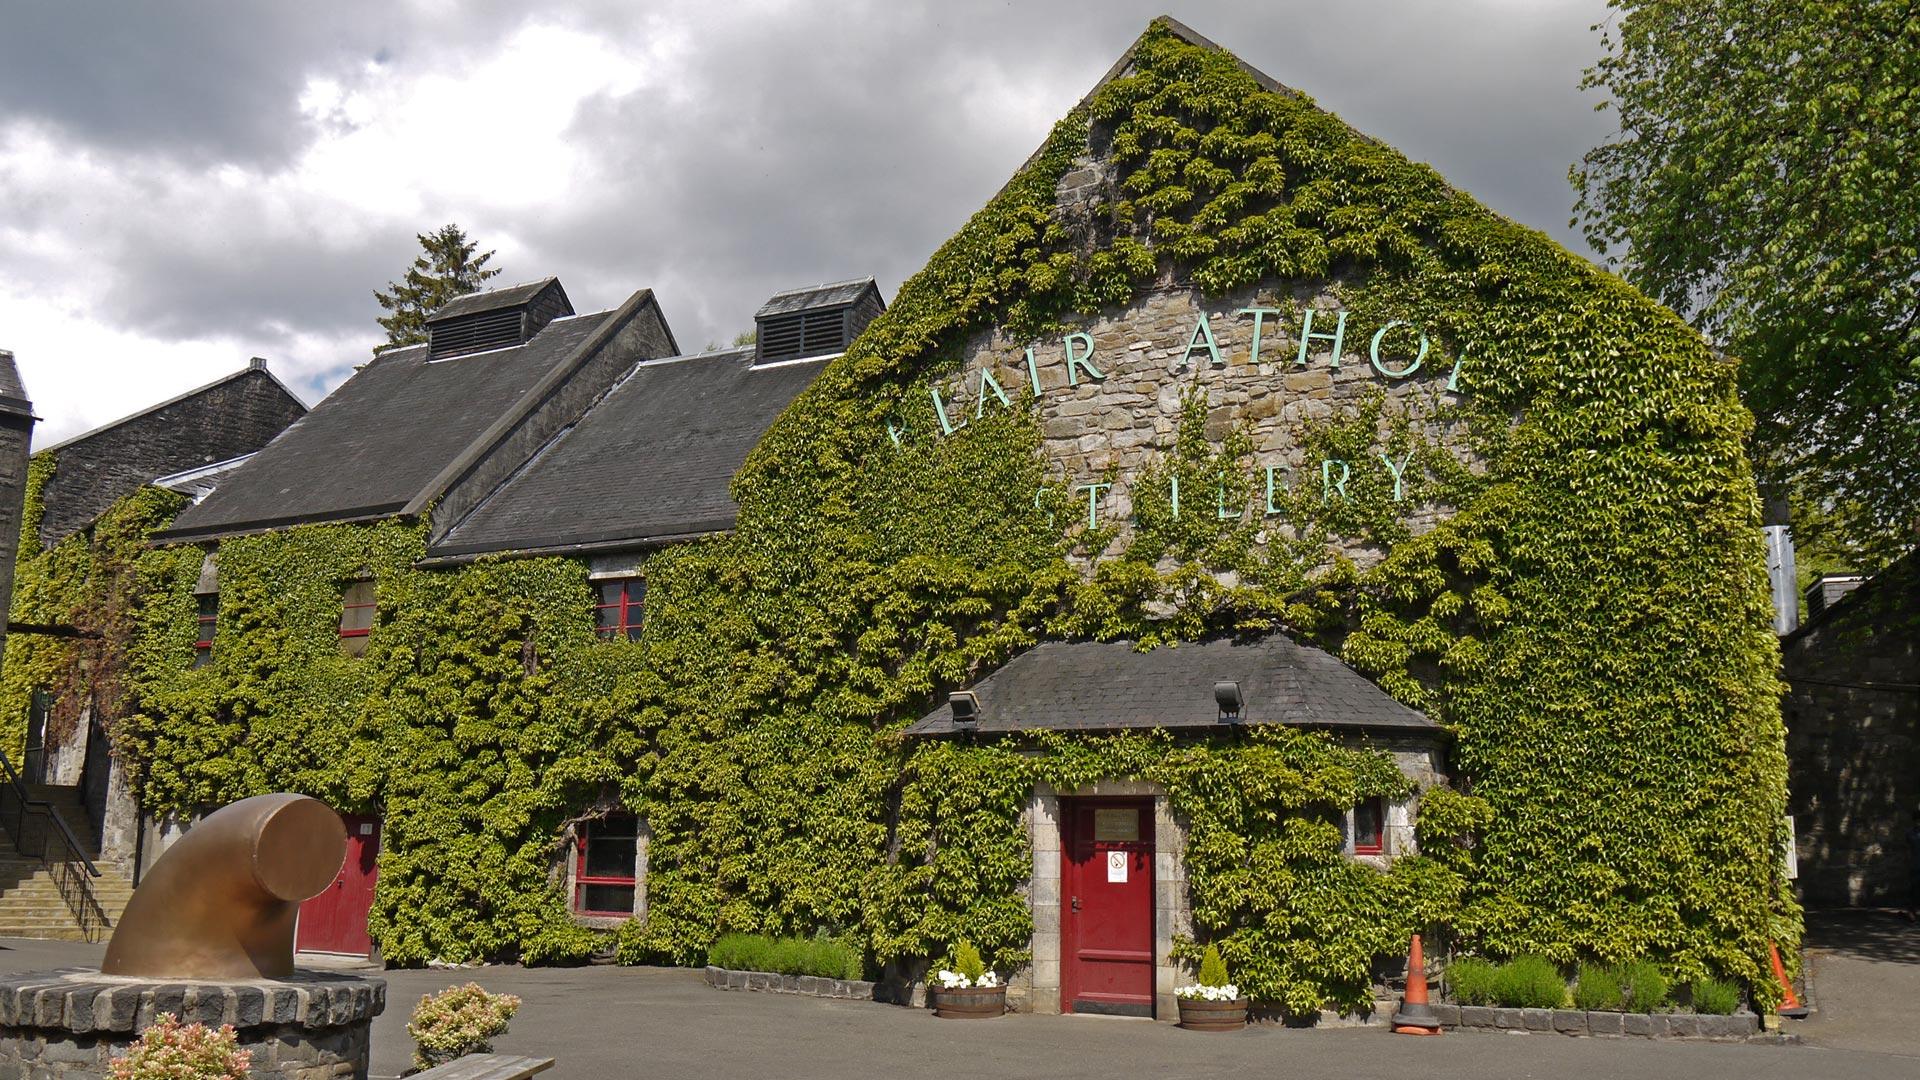 Geheimtipp aus den Highlands: Blair Athol aus Pitlochry. (Foto: Alkoblog)